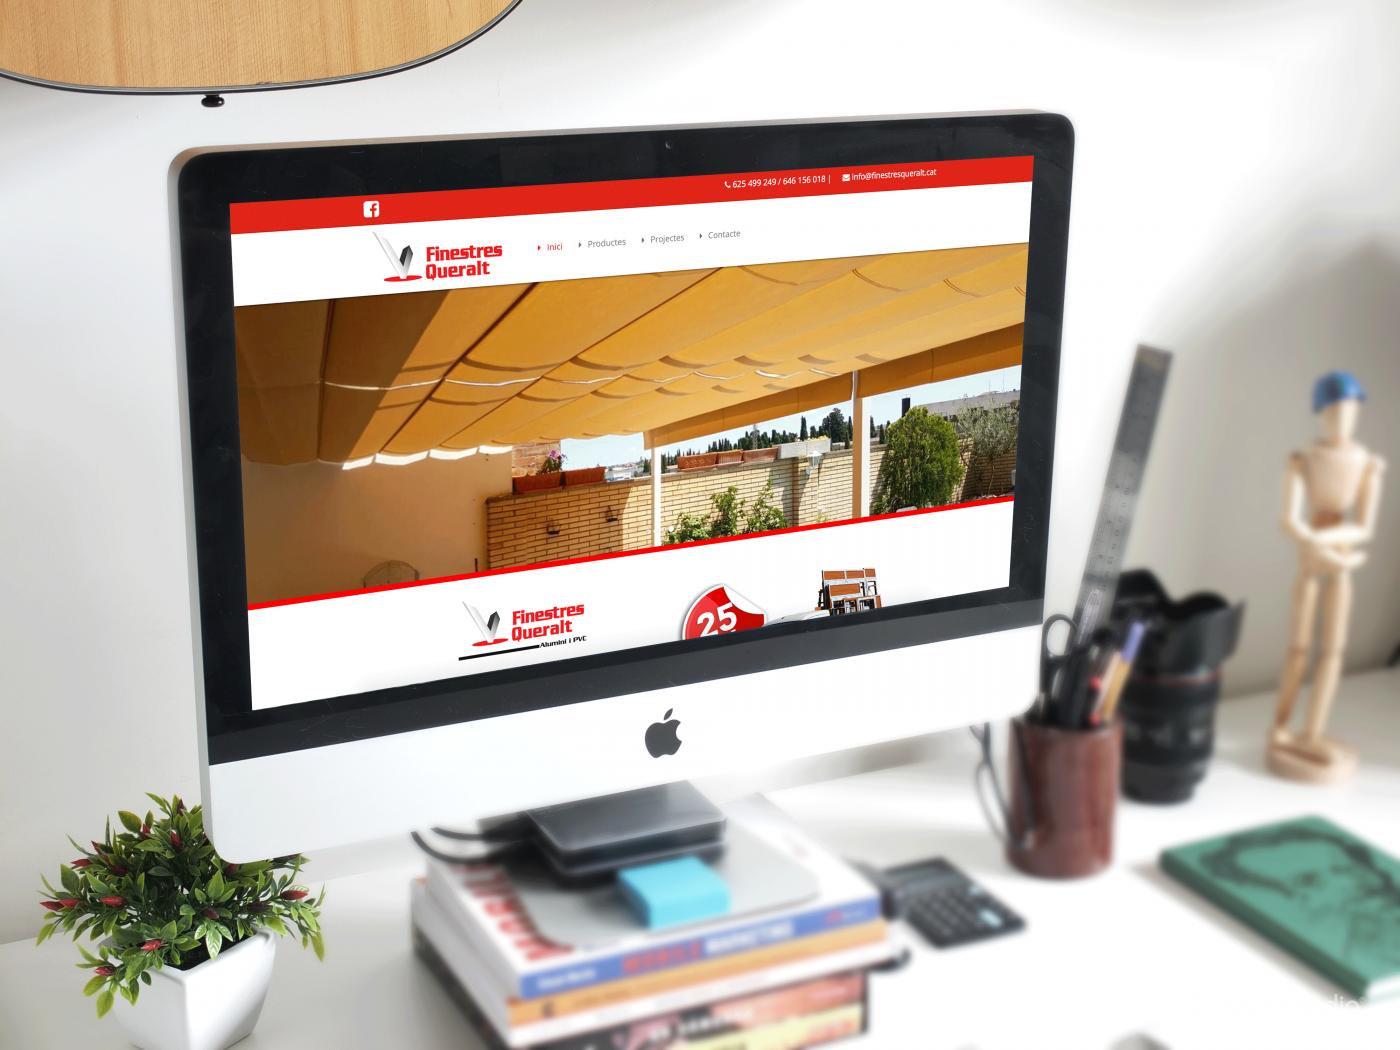 Nueva página web para la empresa Finestres Queralt